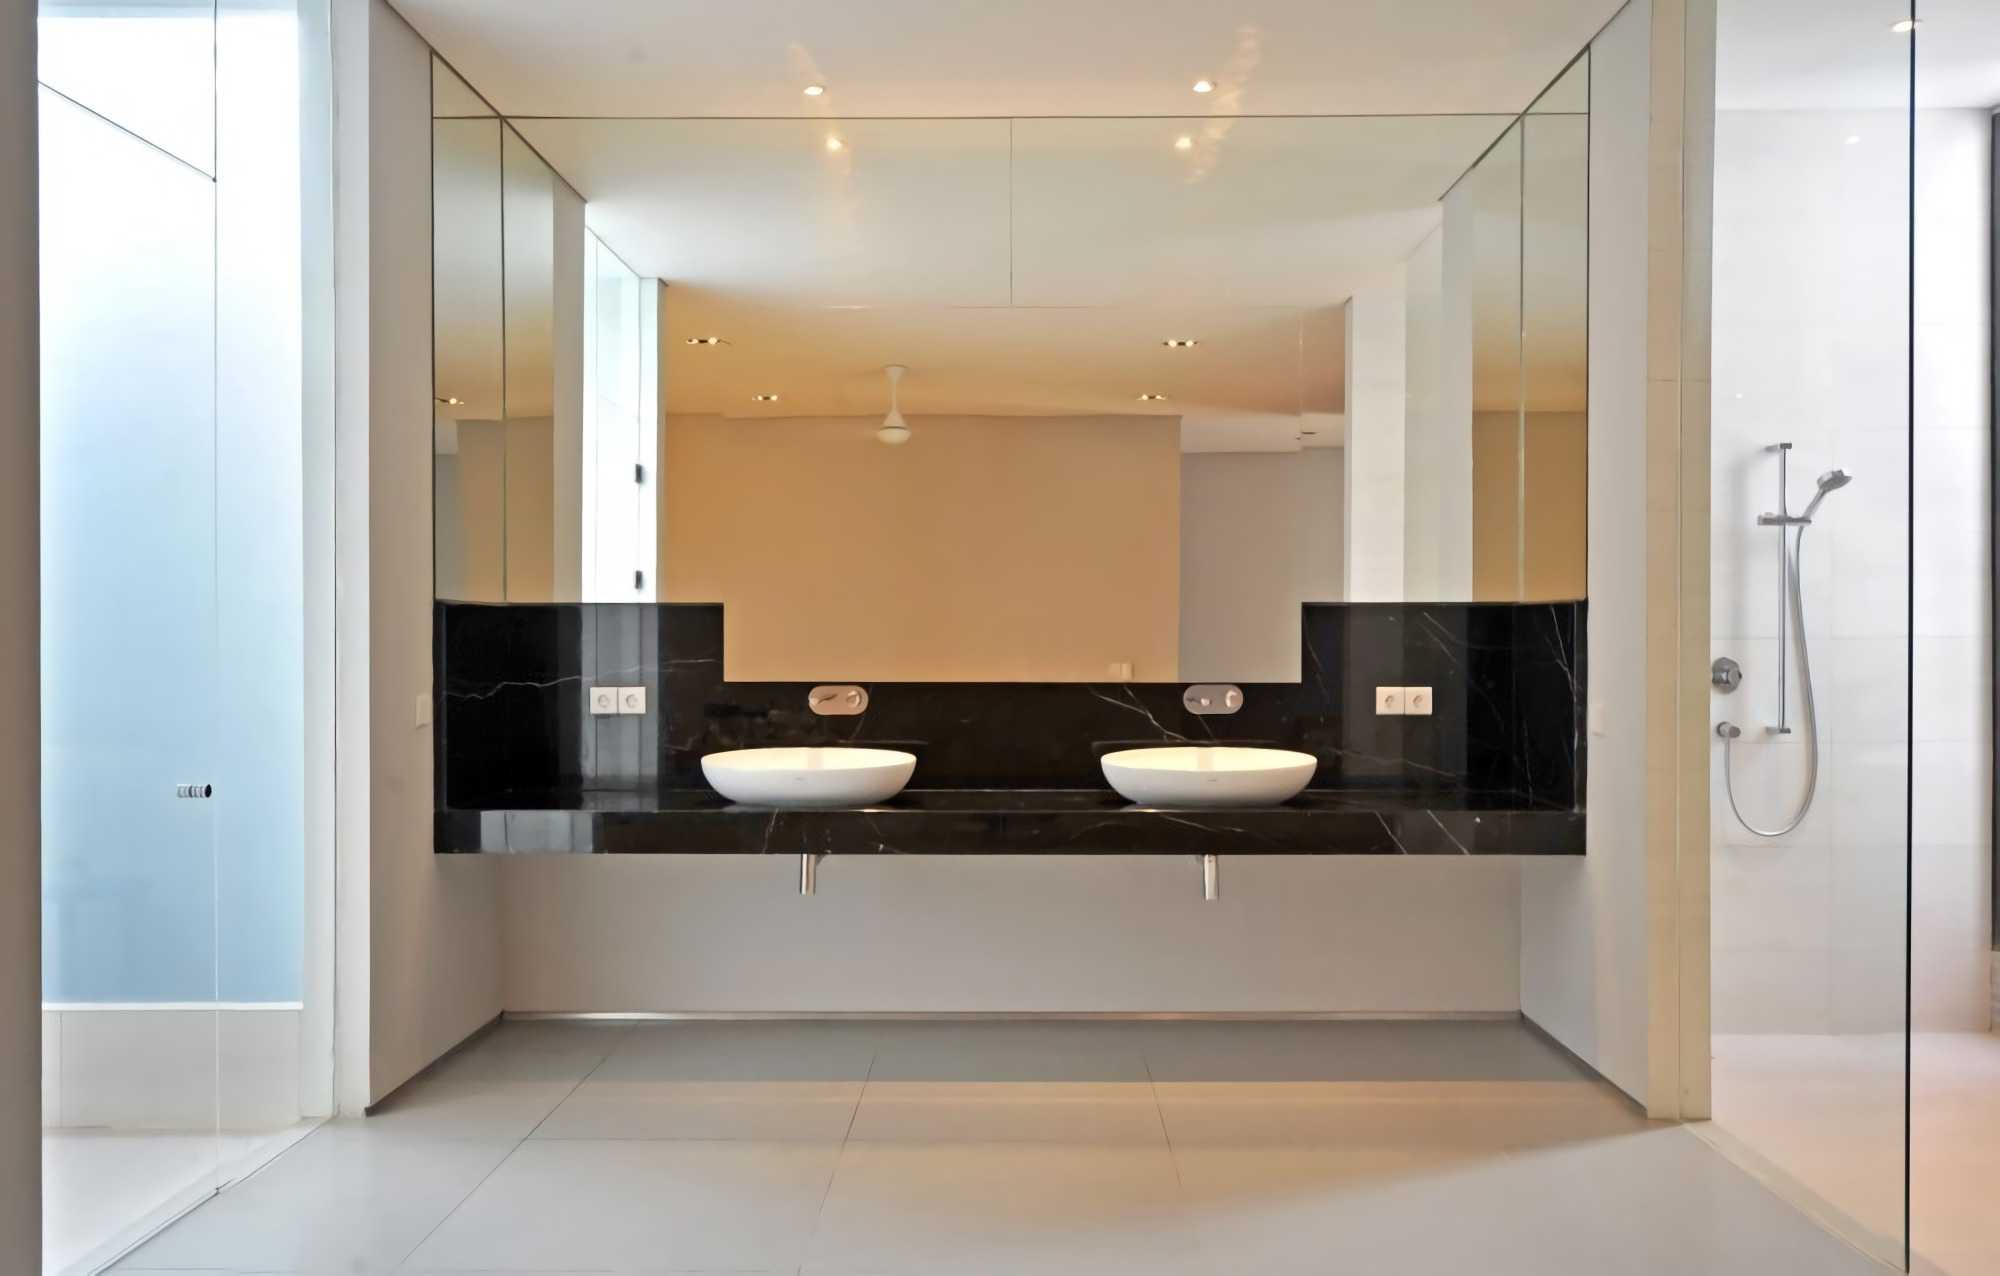 Ivan Priatman Architecture Ddyw Residence Surabaya, Kota Sby, Jawa Timur, Indonesia Surabaya Bathroom   23722